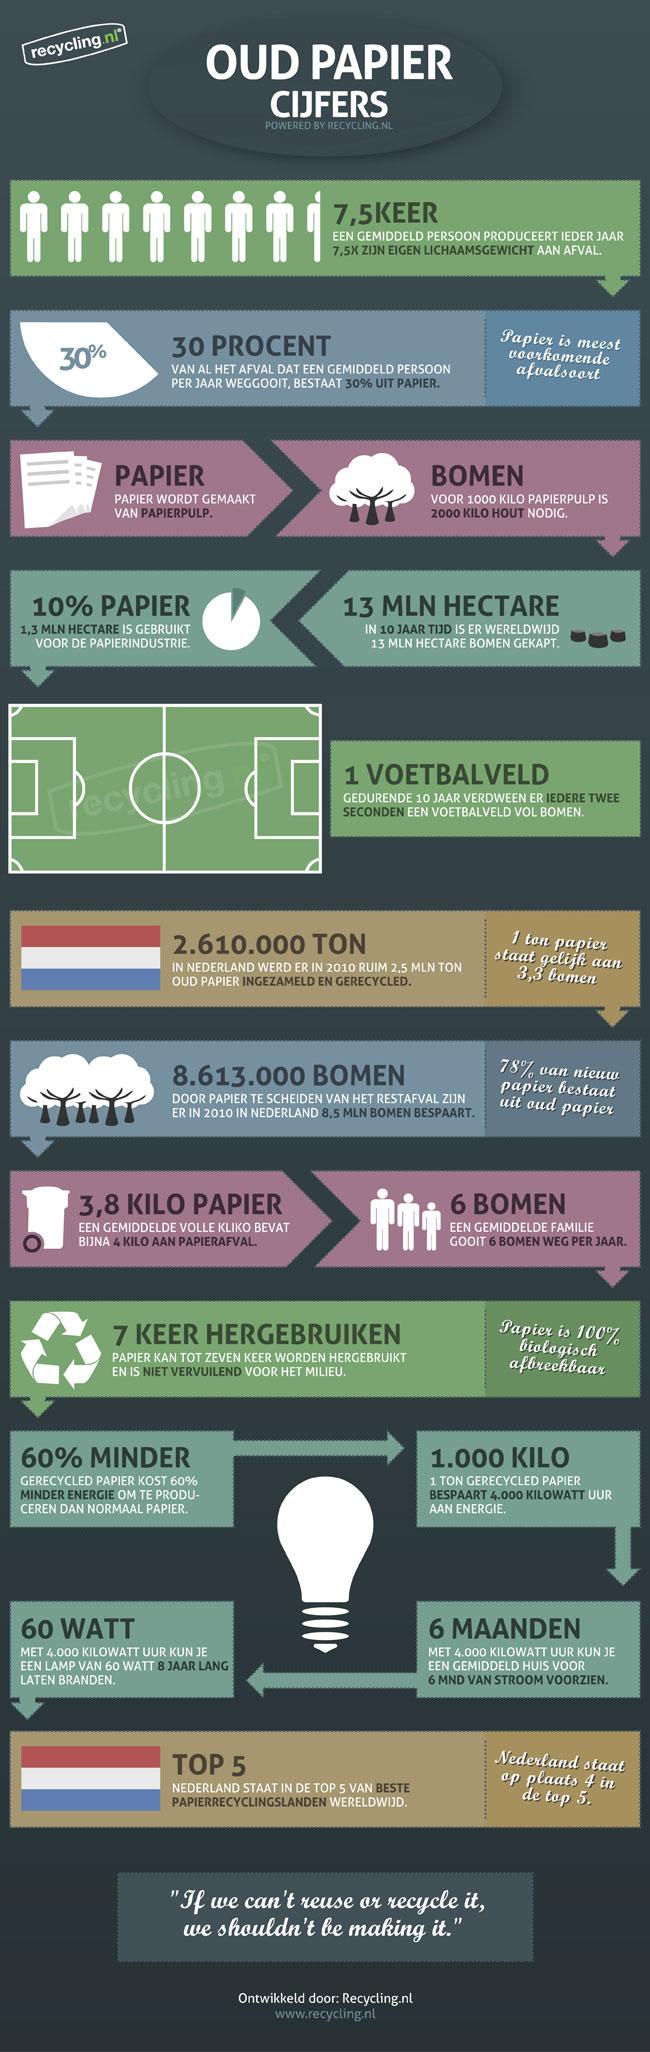 Infographic Oud papier in cijfers